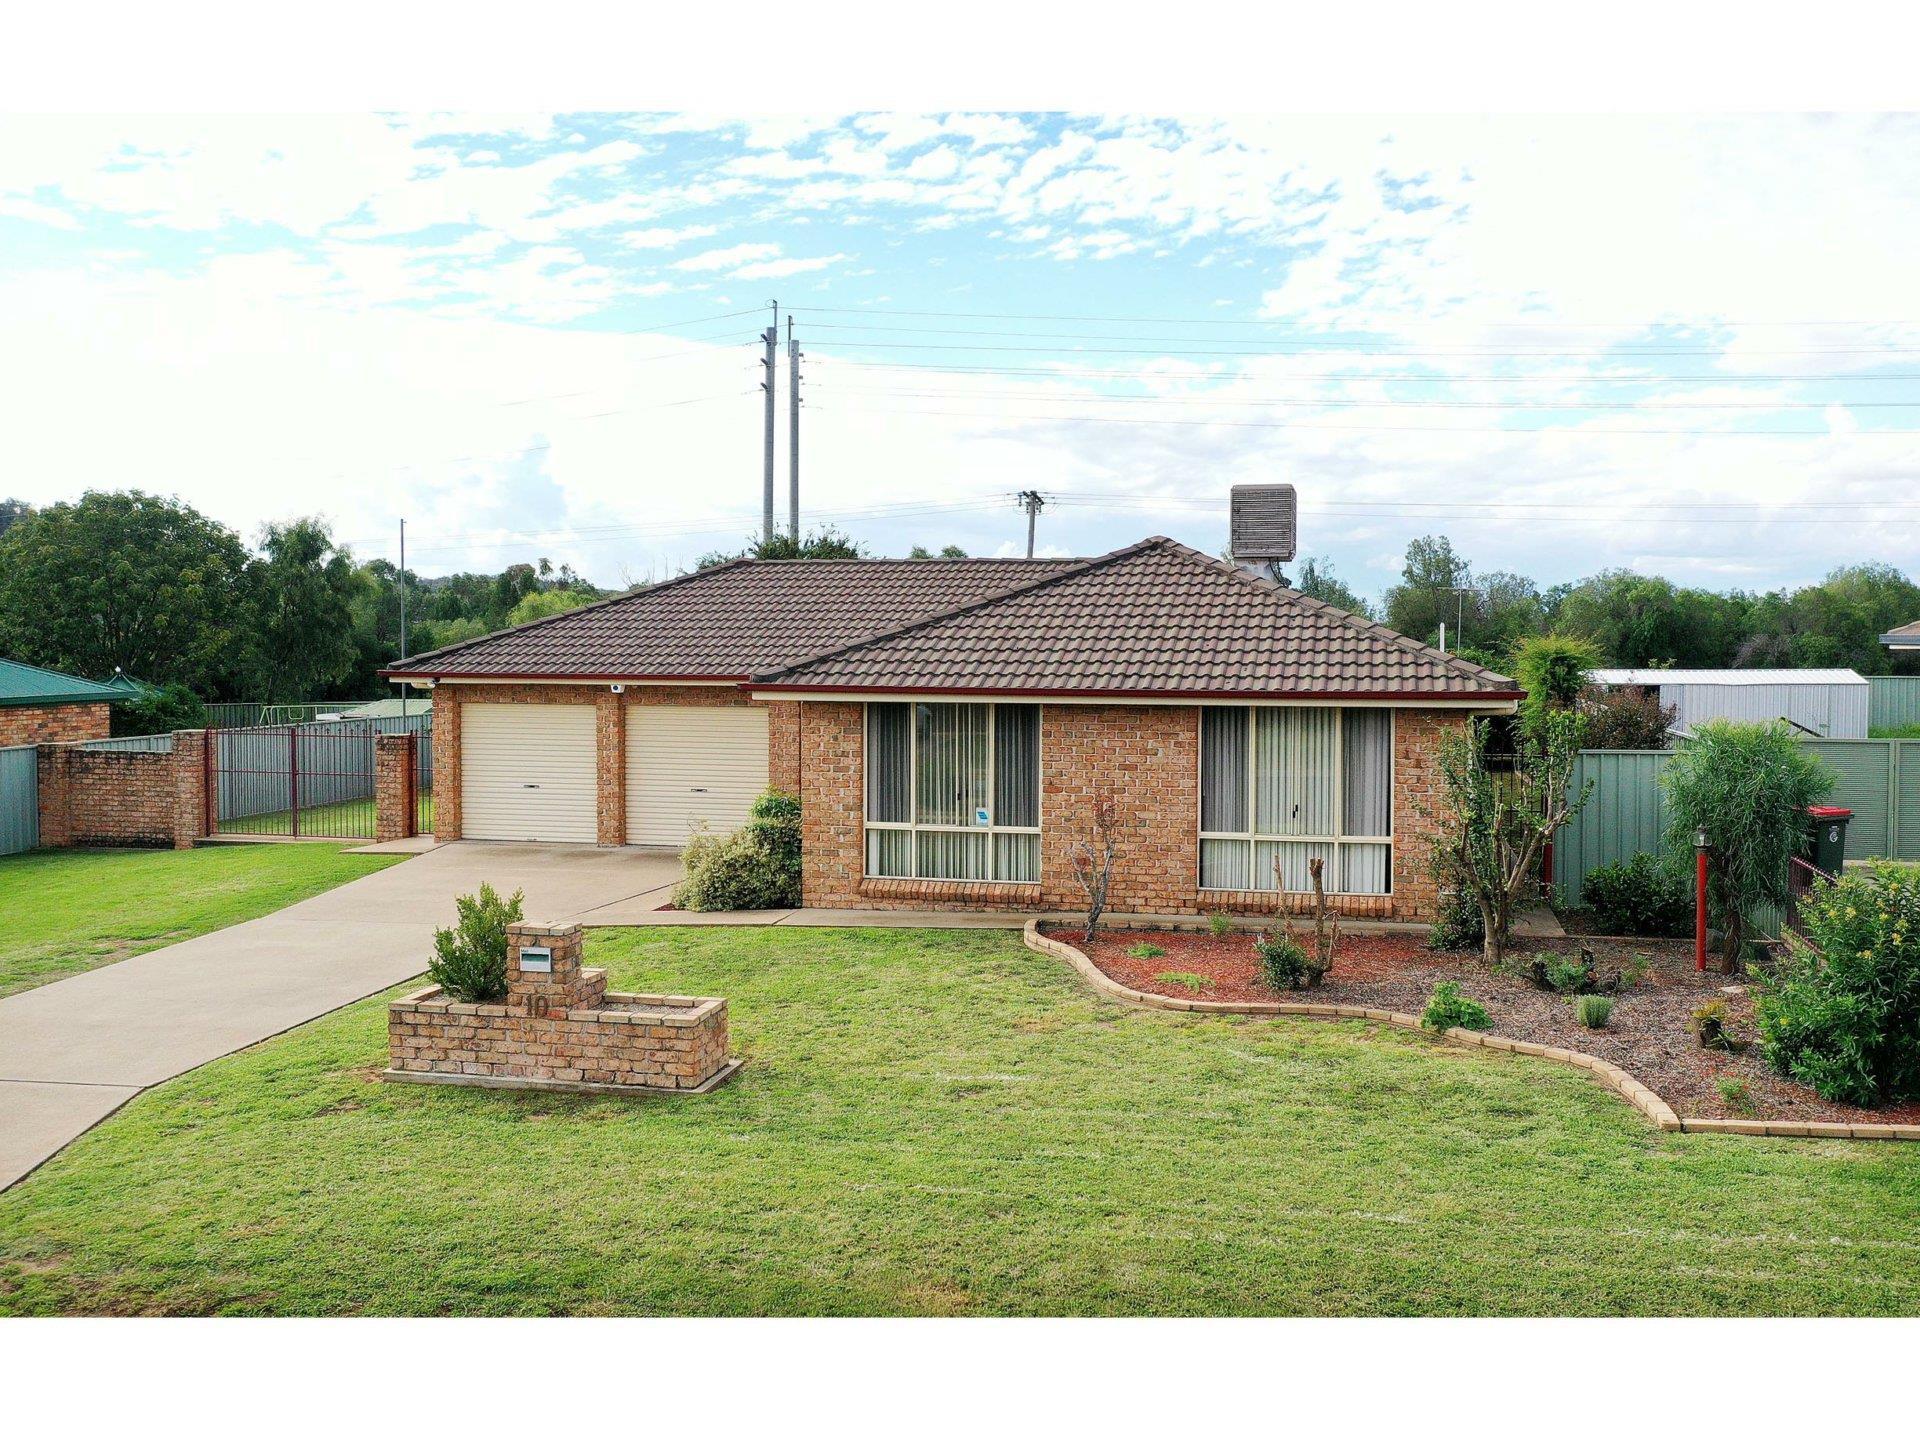 19 Wattle St, Gunnedah, NSW 19 - House Sold October 19